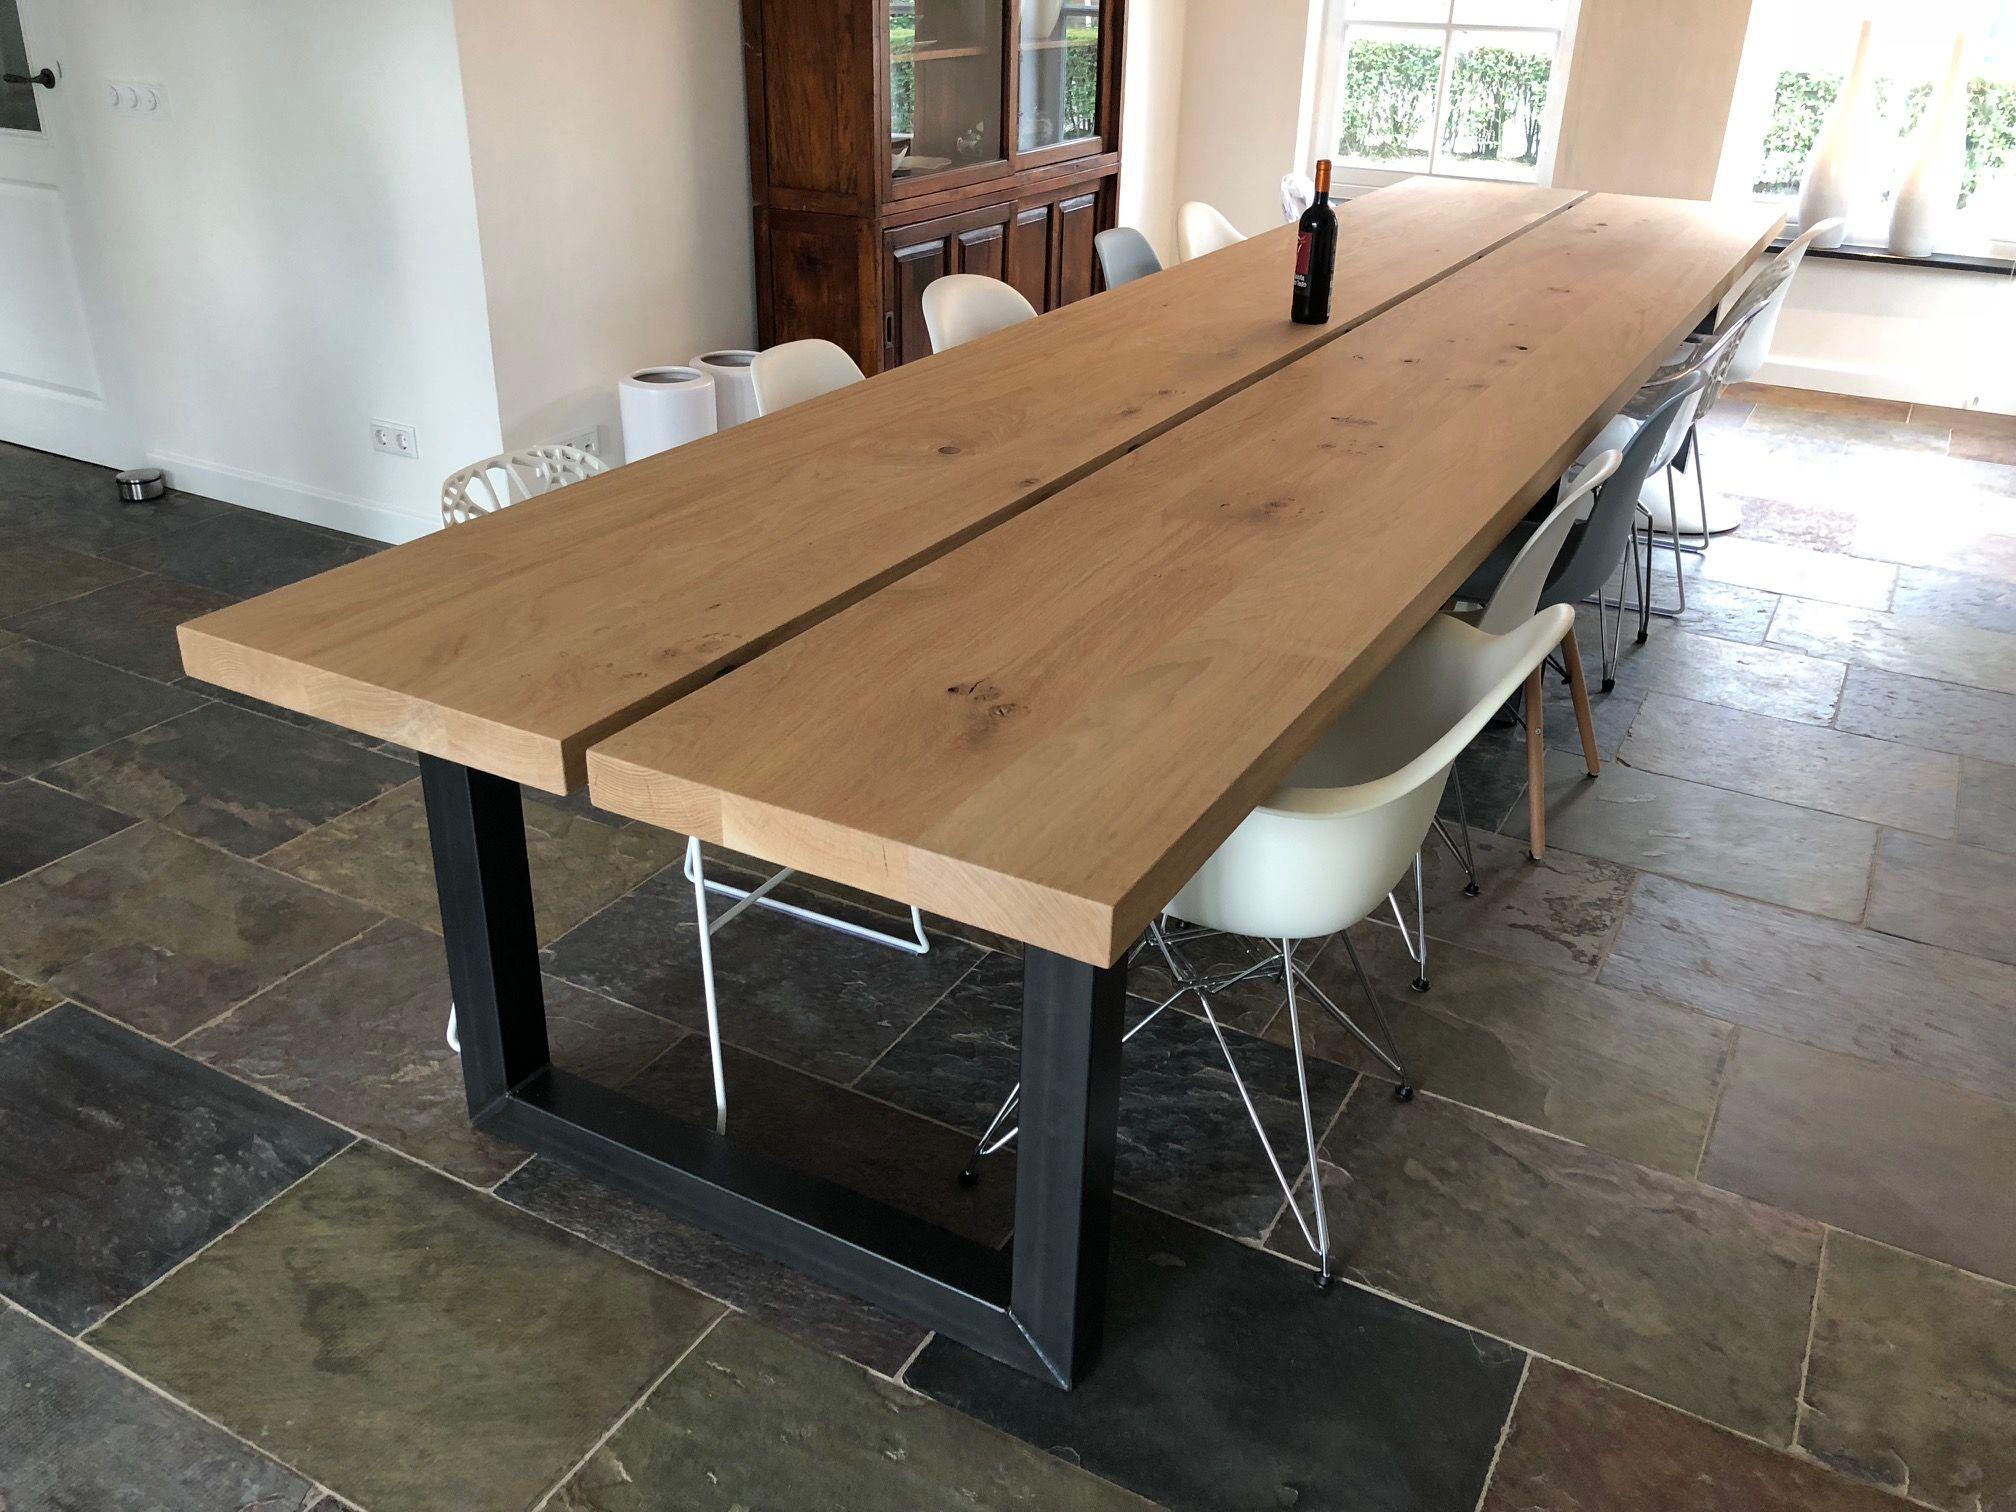 Eikenhouten Tafel 4 Meter.Pin Op Portfolio Oak Steel